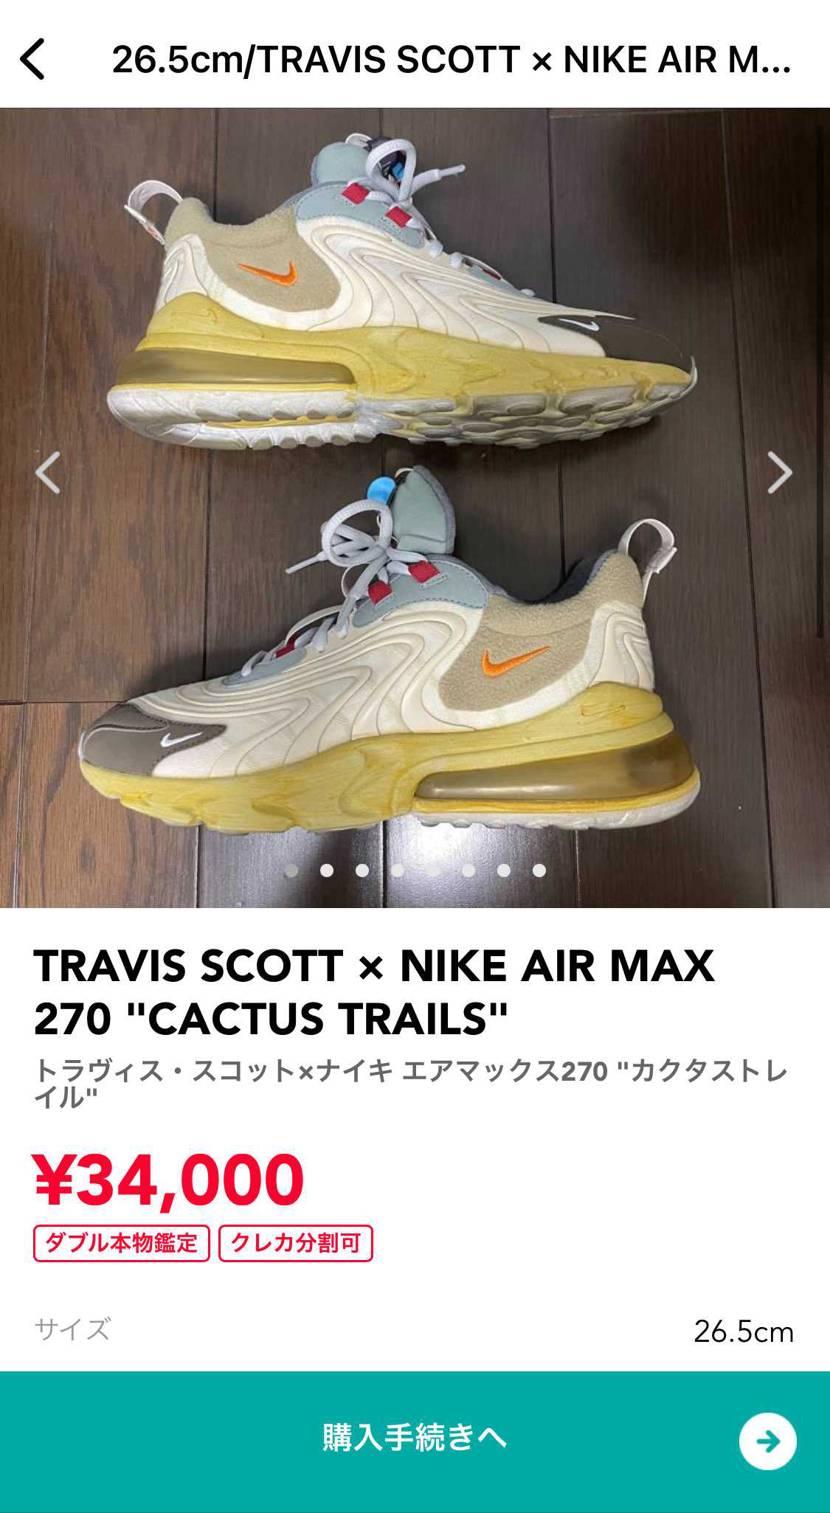 26.5cm 34000円にて販売中です。是非に。